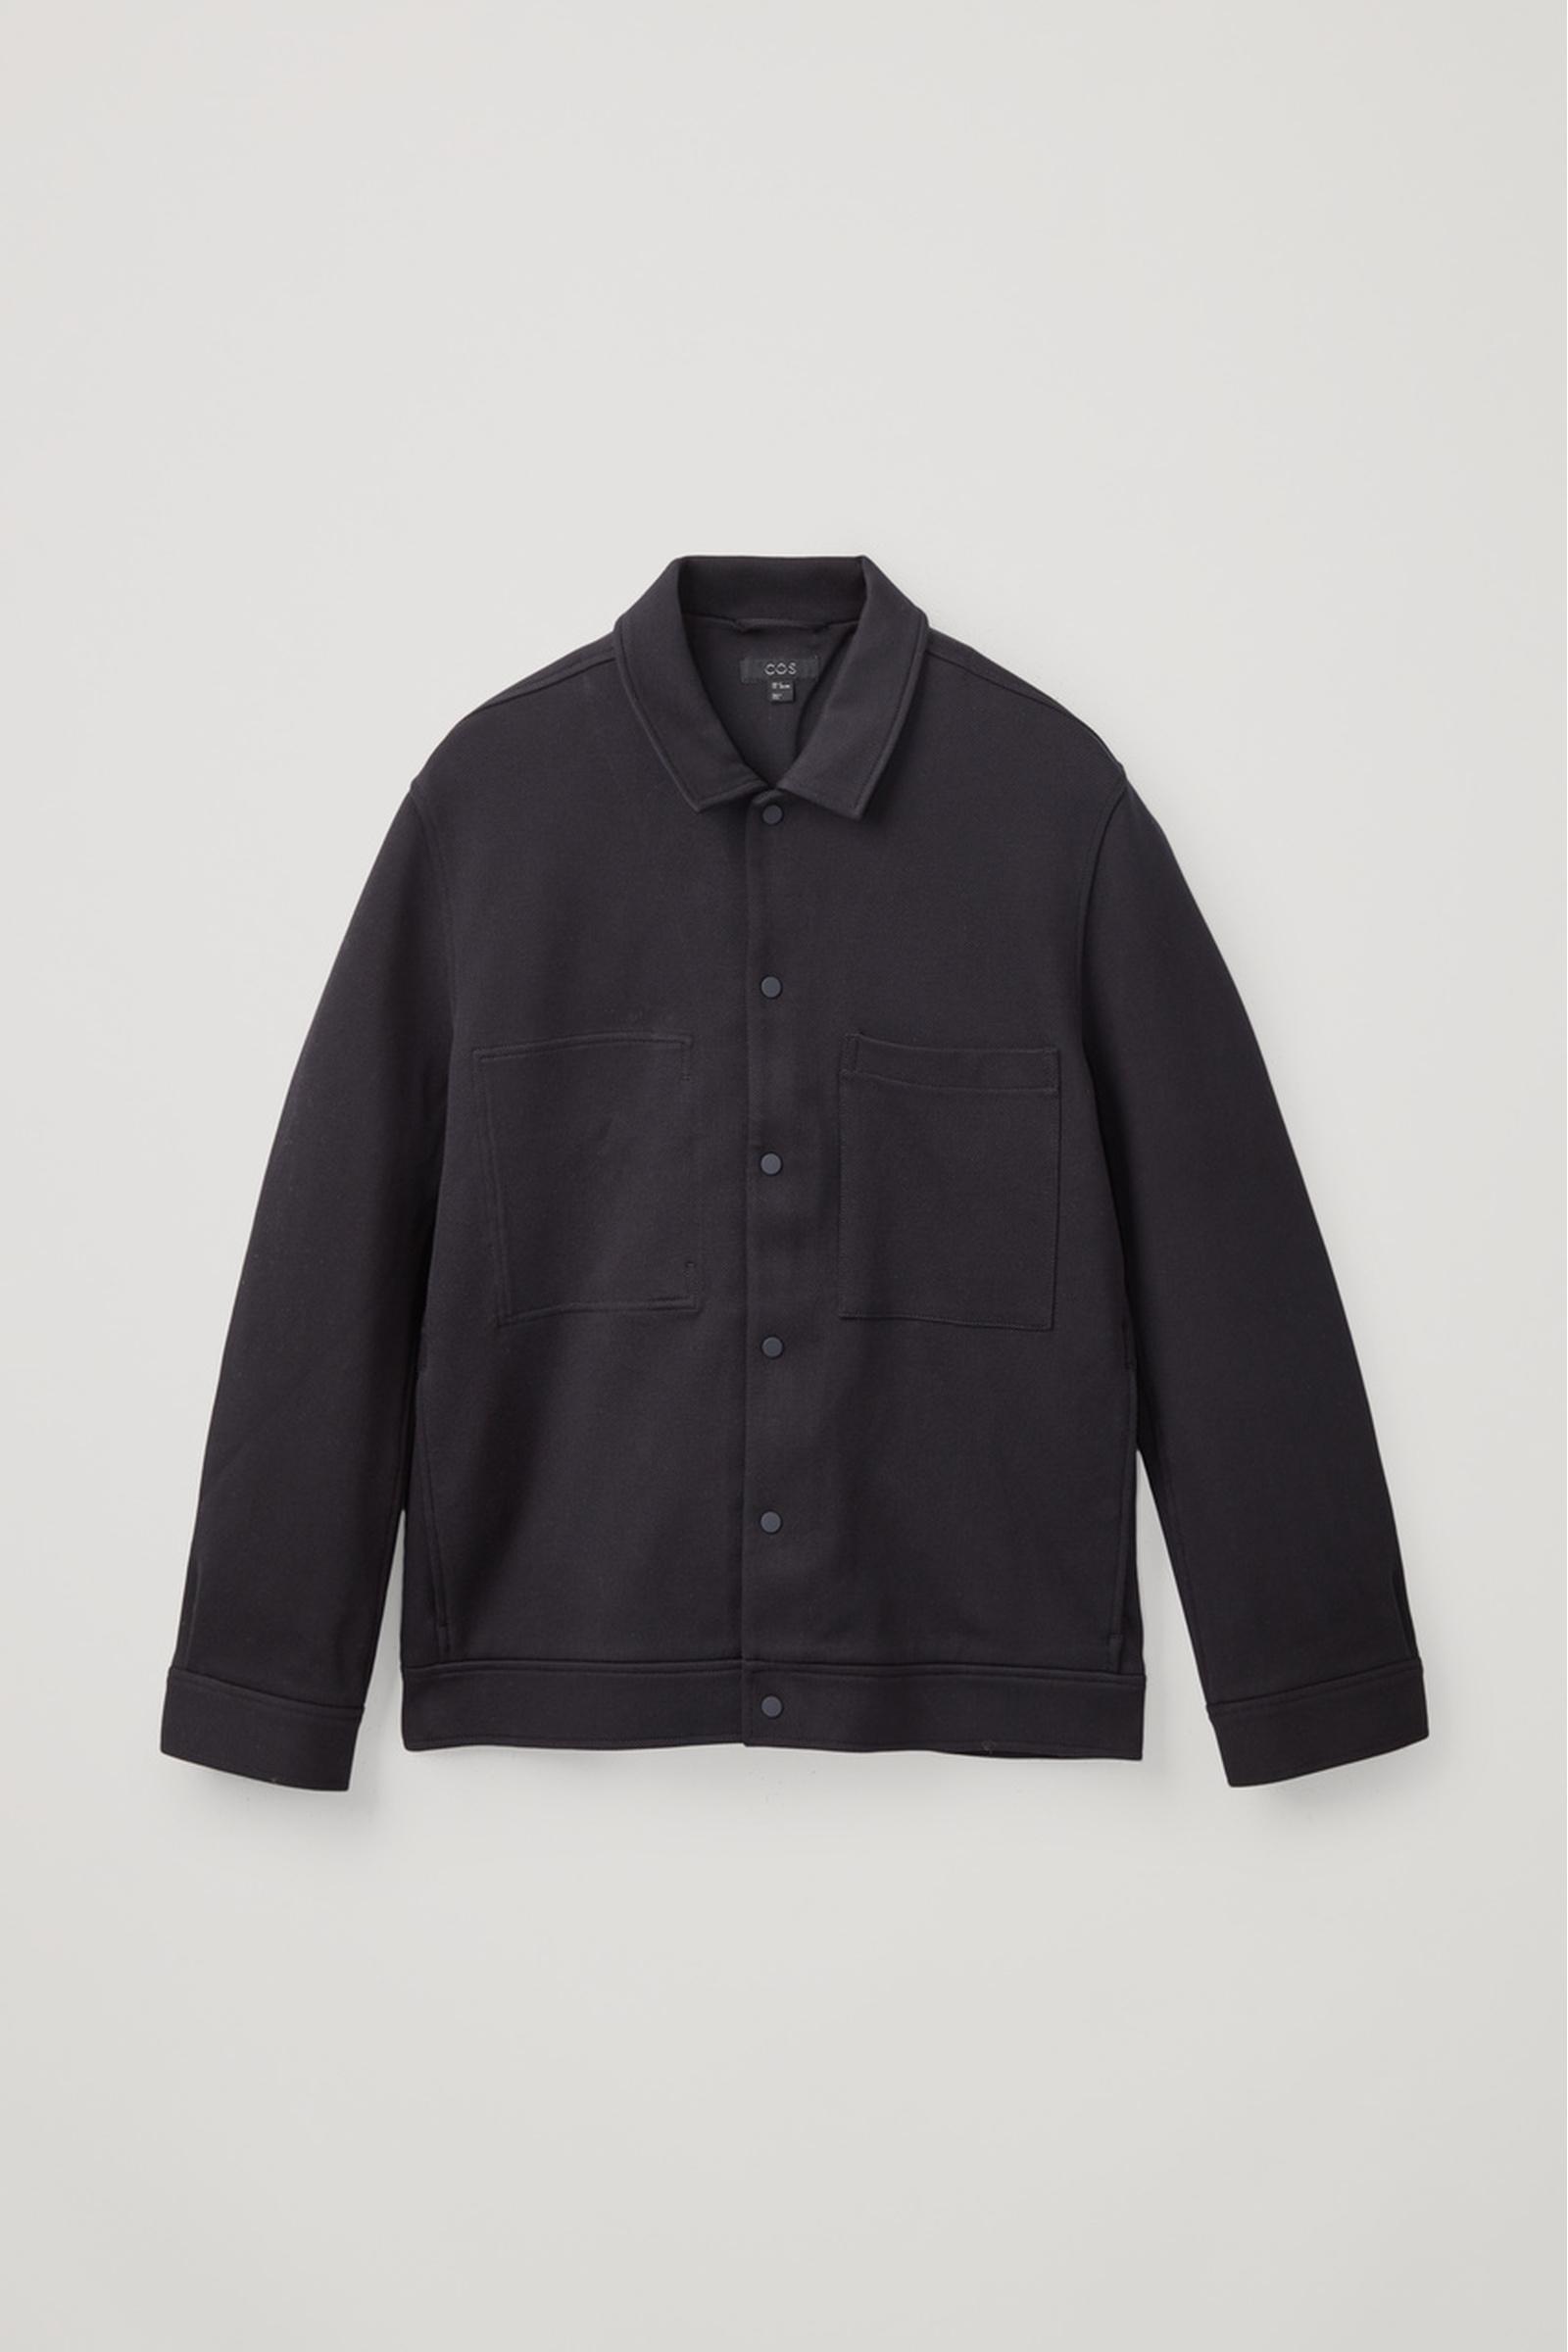 COS 트윌 셔츠 재킷의 미드나이트 블루컬러 Product입니다.